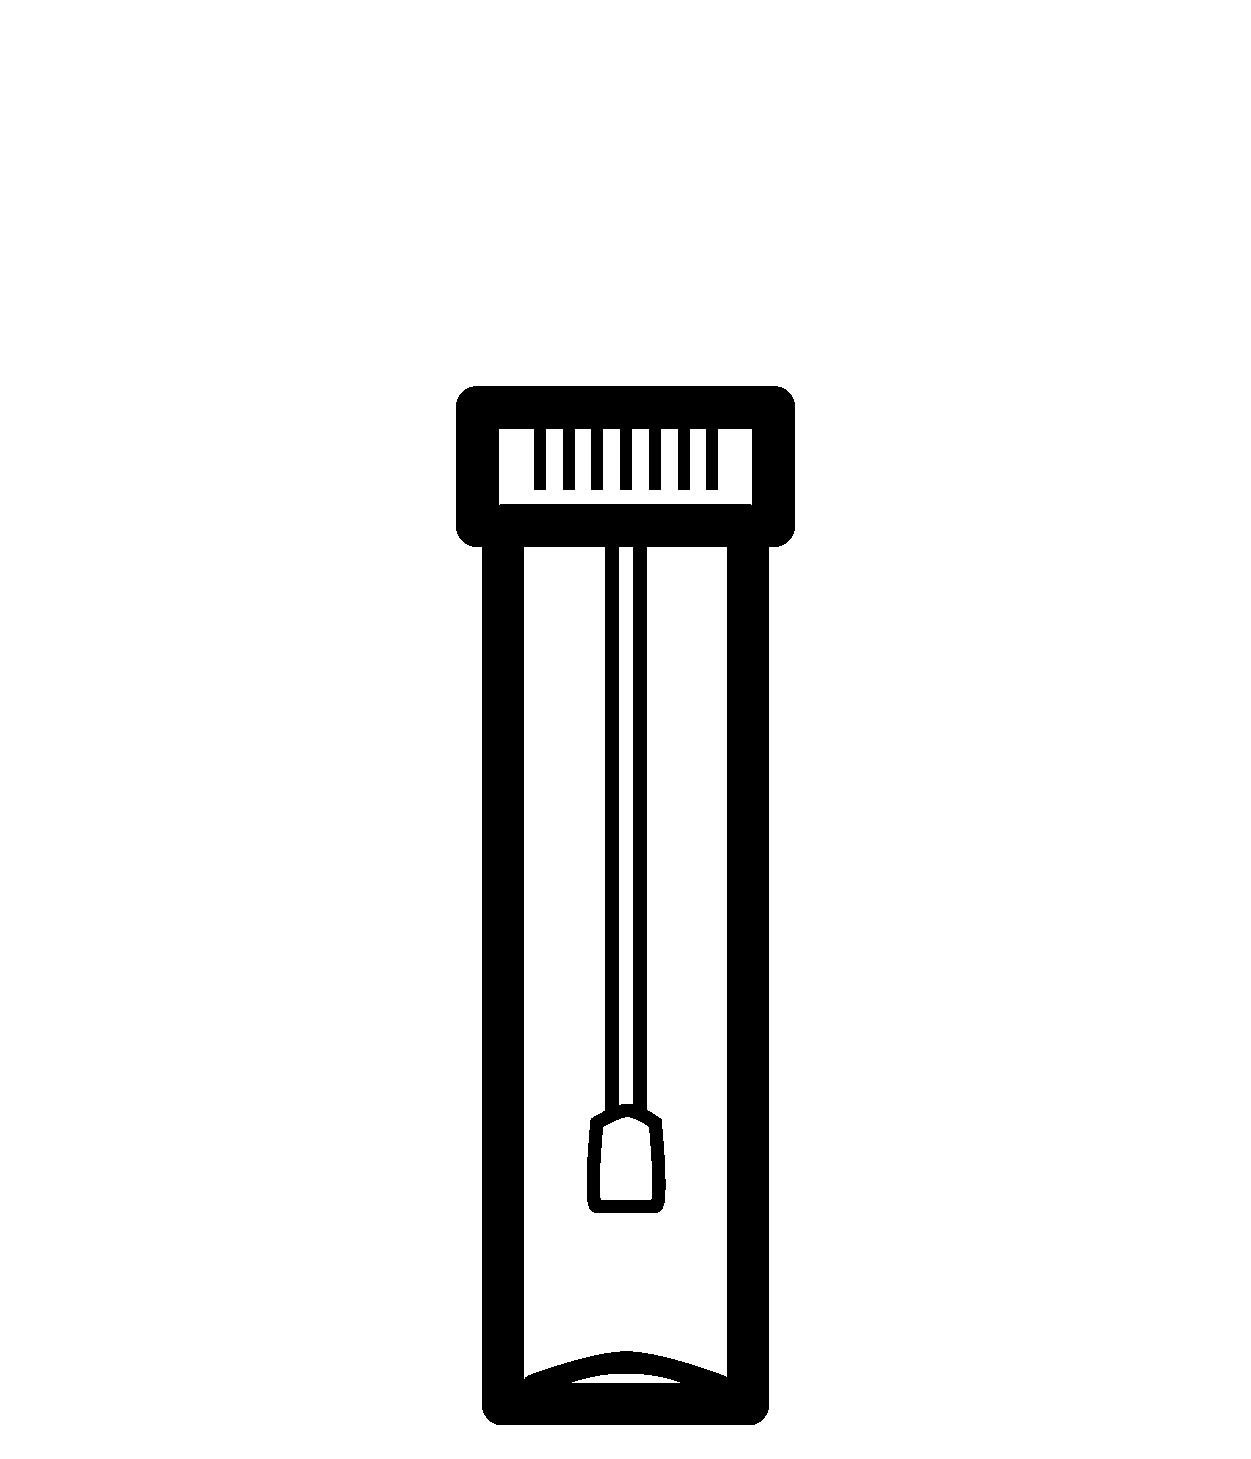 Amient Temperature Icon for Feces